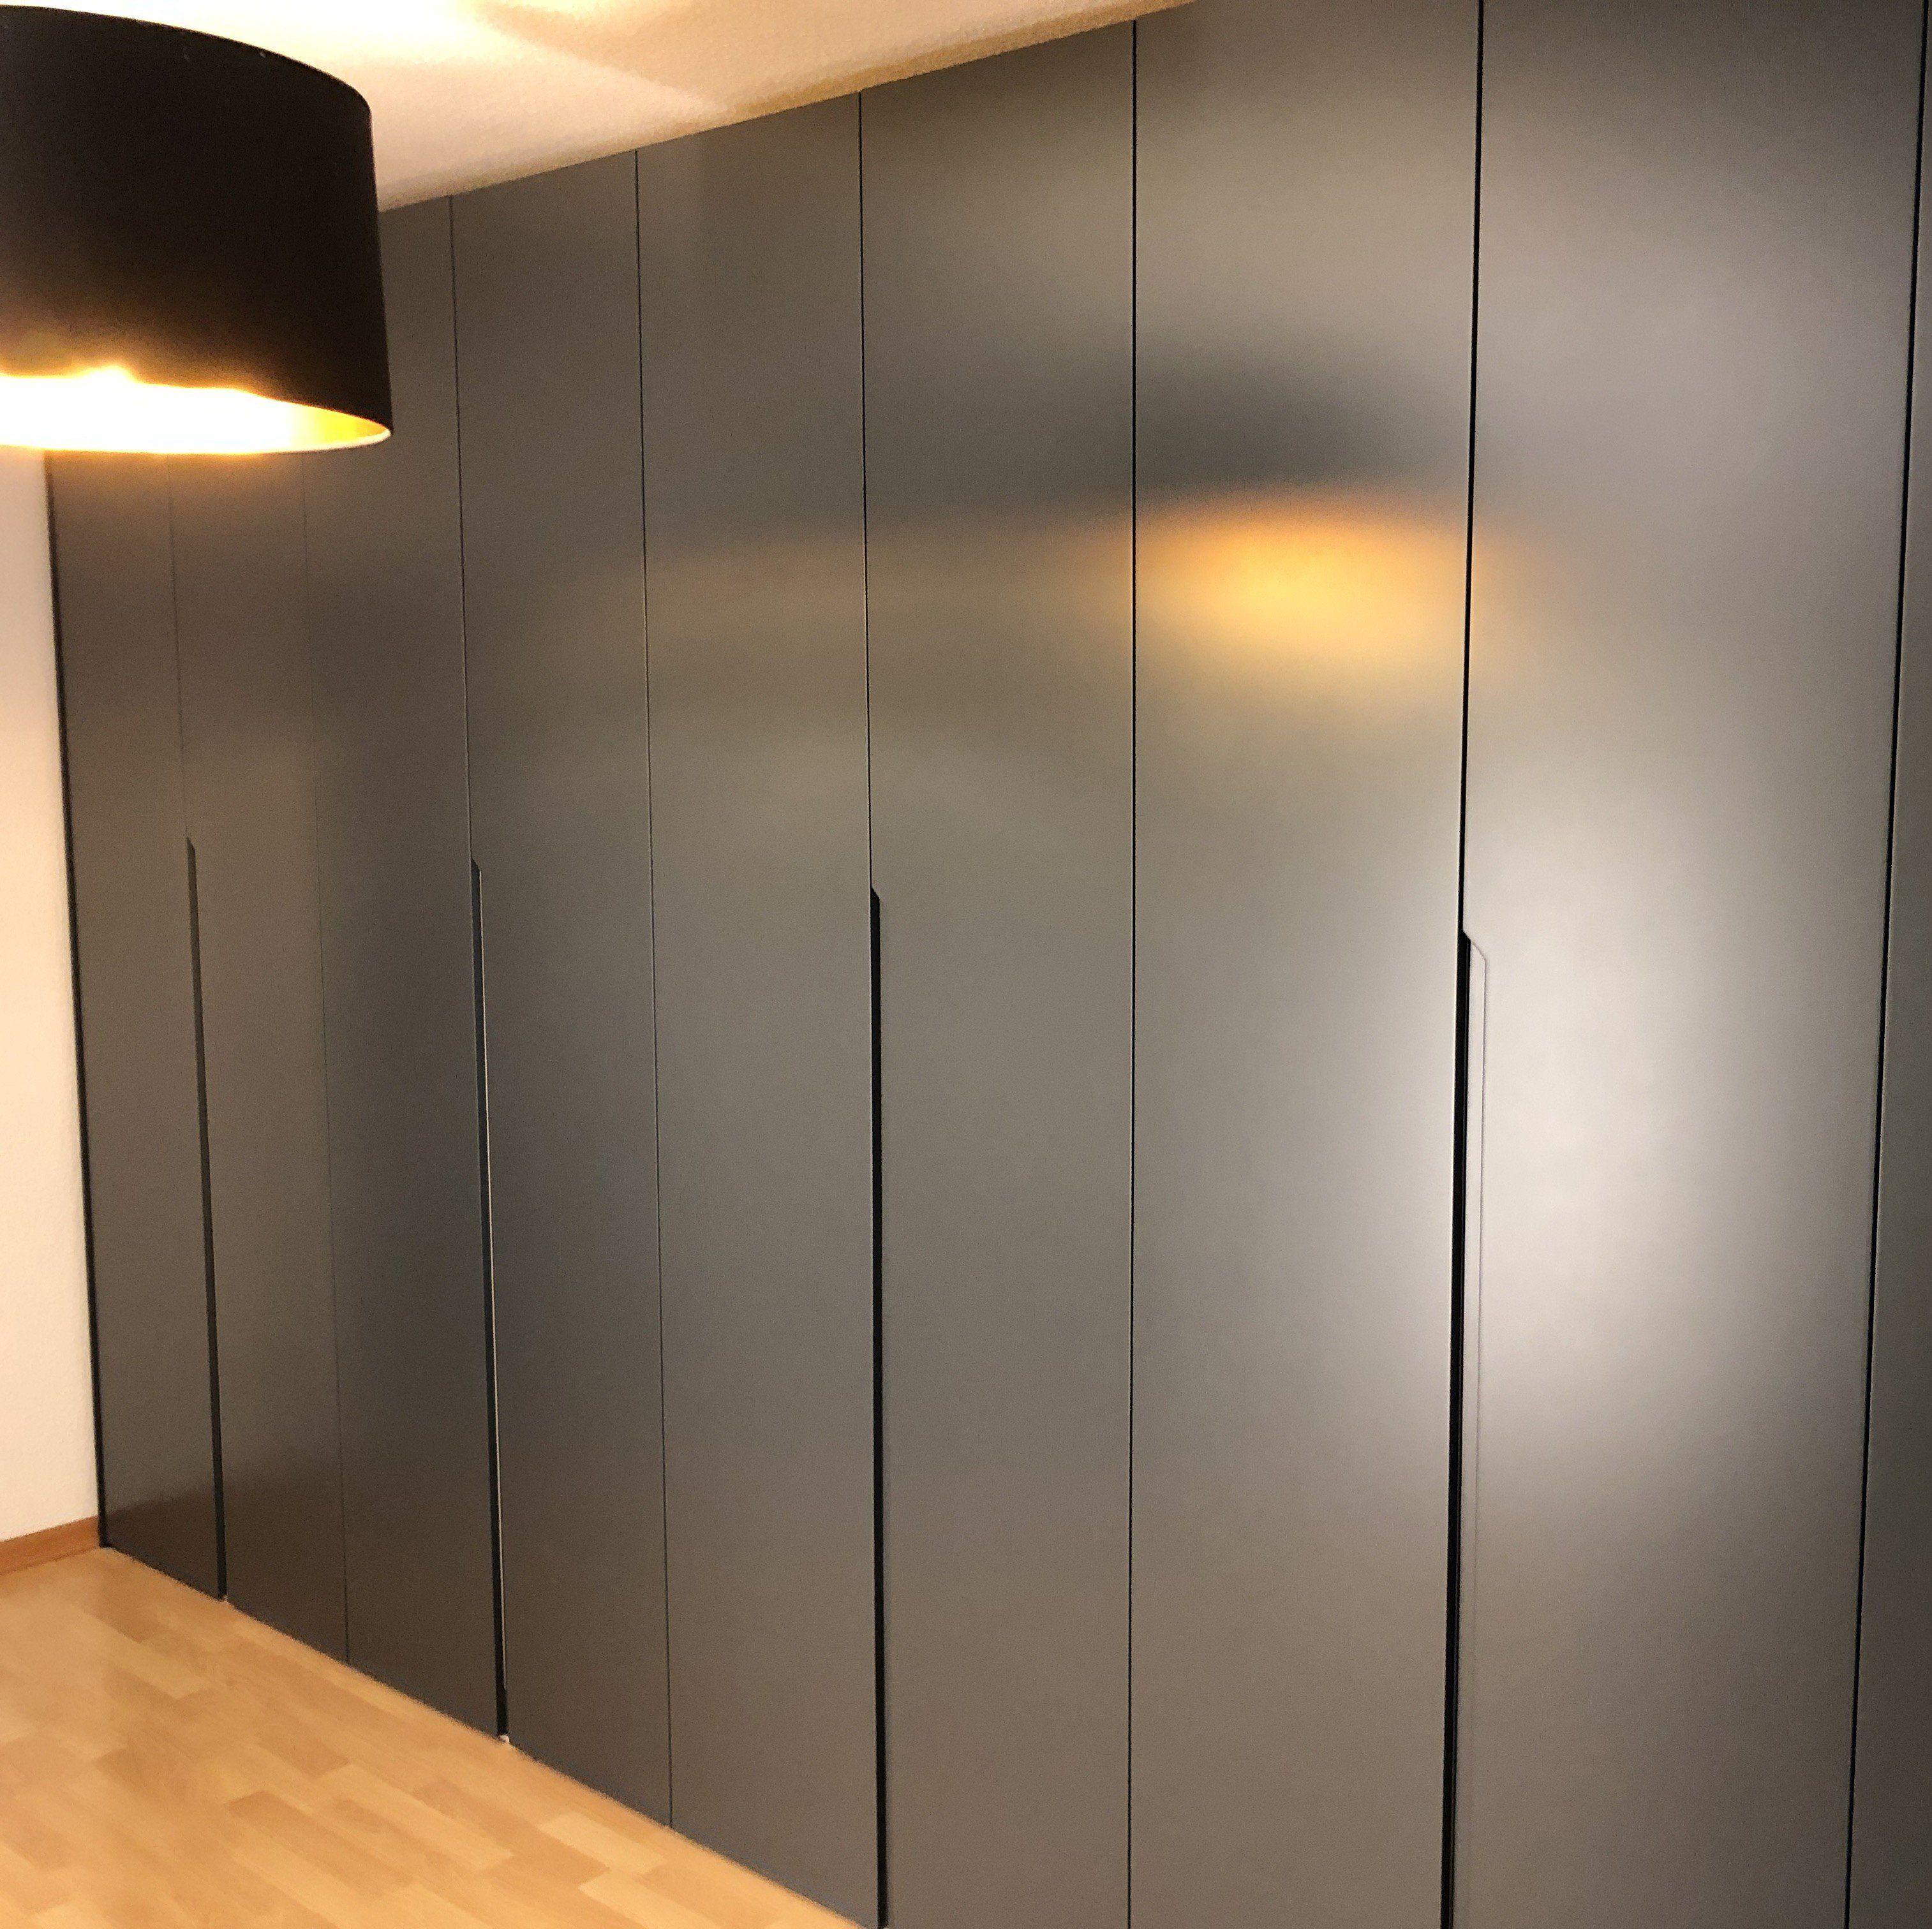 Schrank Nach Mass In 2020 Wardrobe Design Bedroom Storage Spaces Cabinet Doors